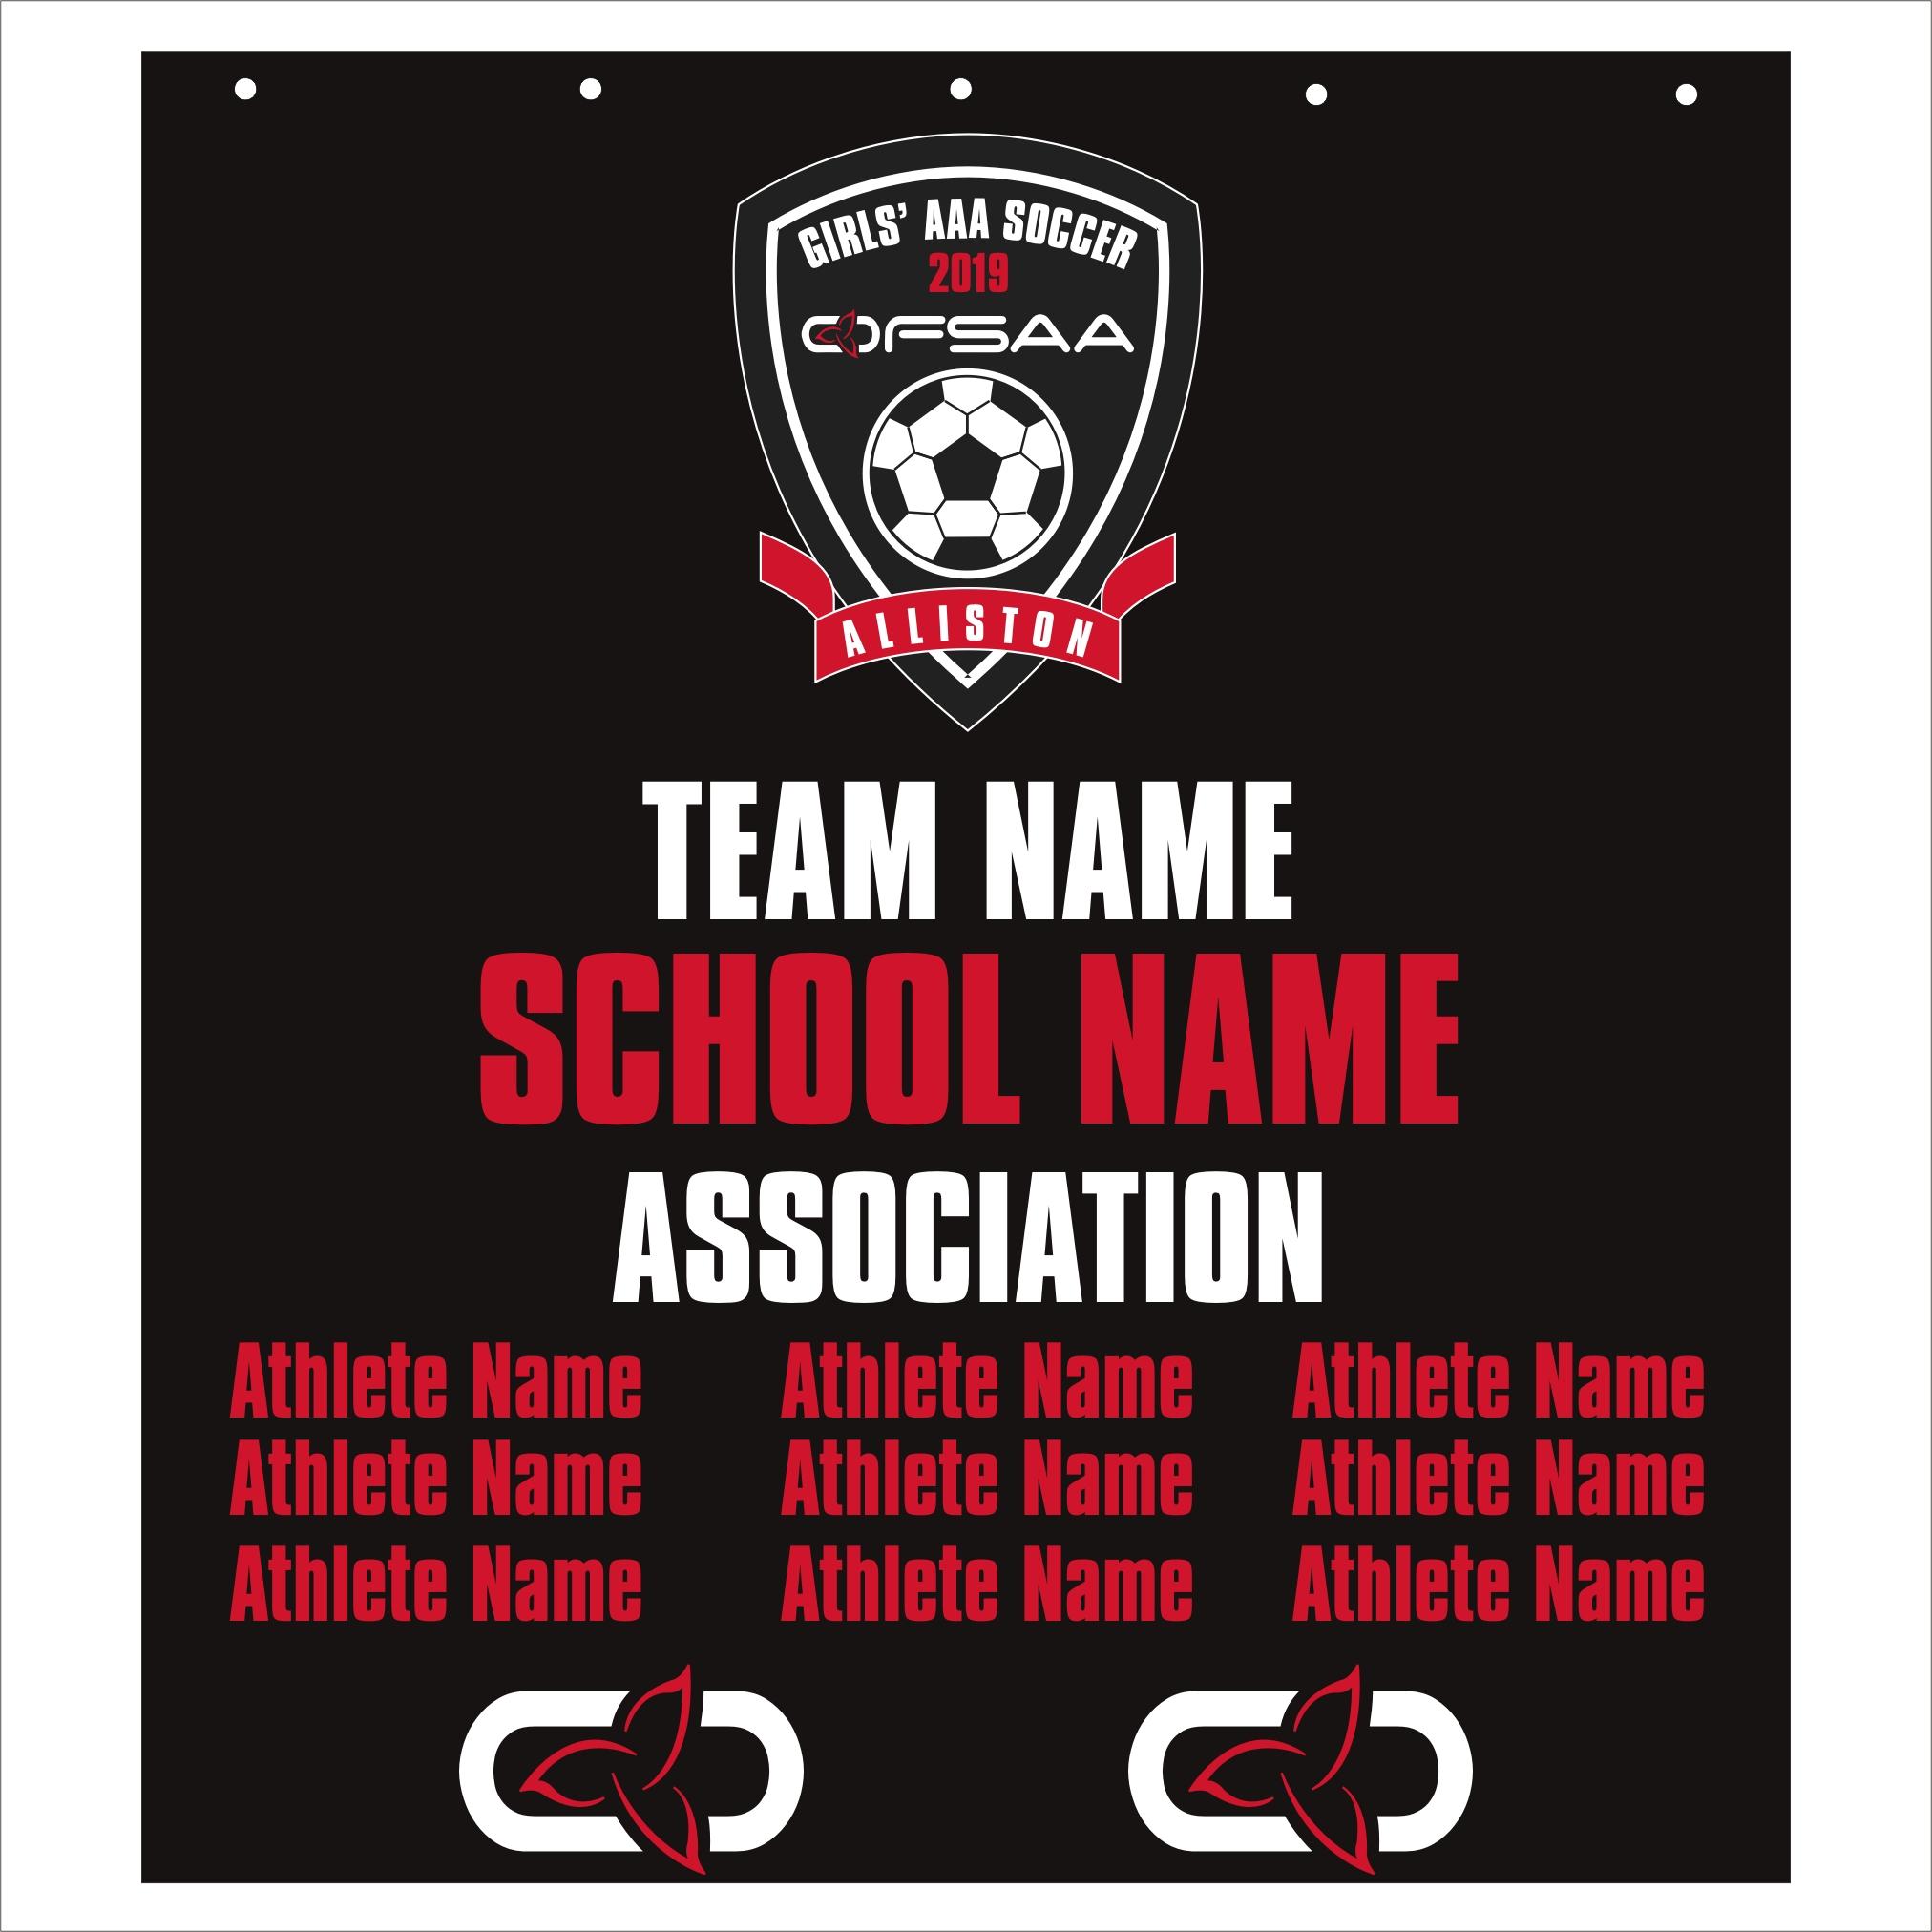 2019 Girls AAA Soccer Banner big black.jpg